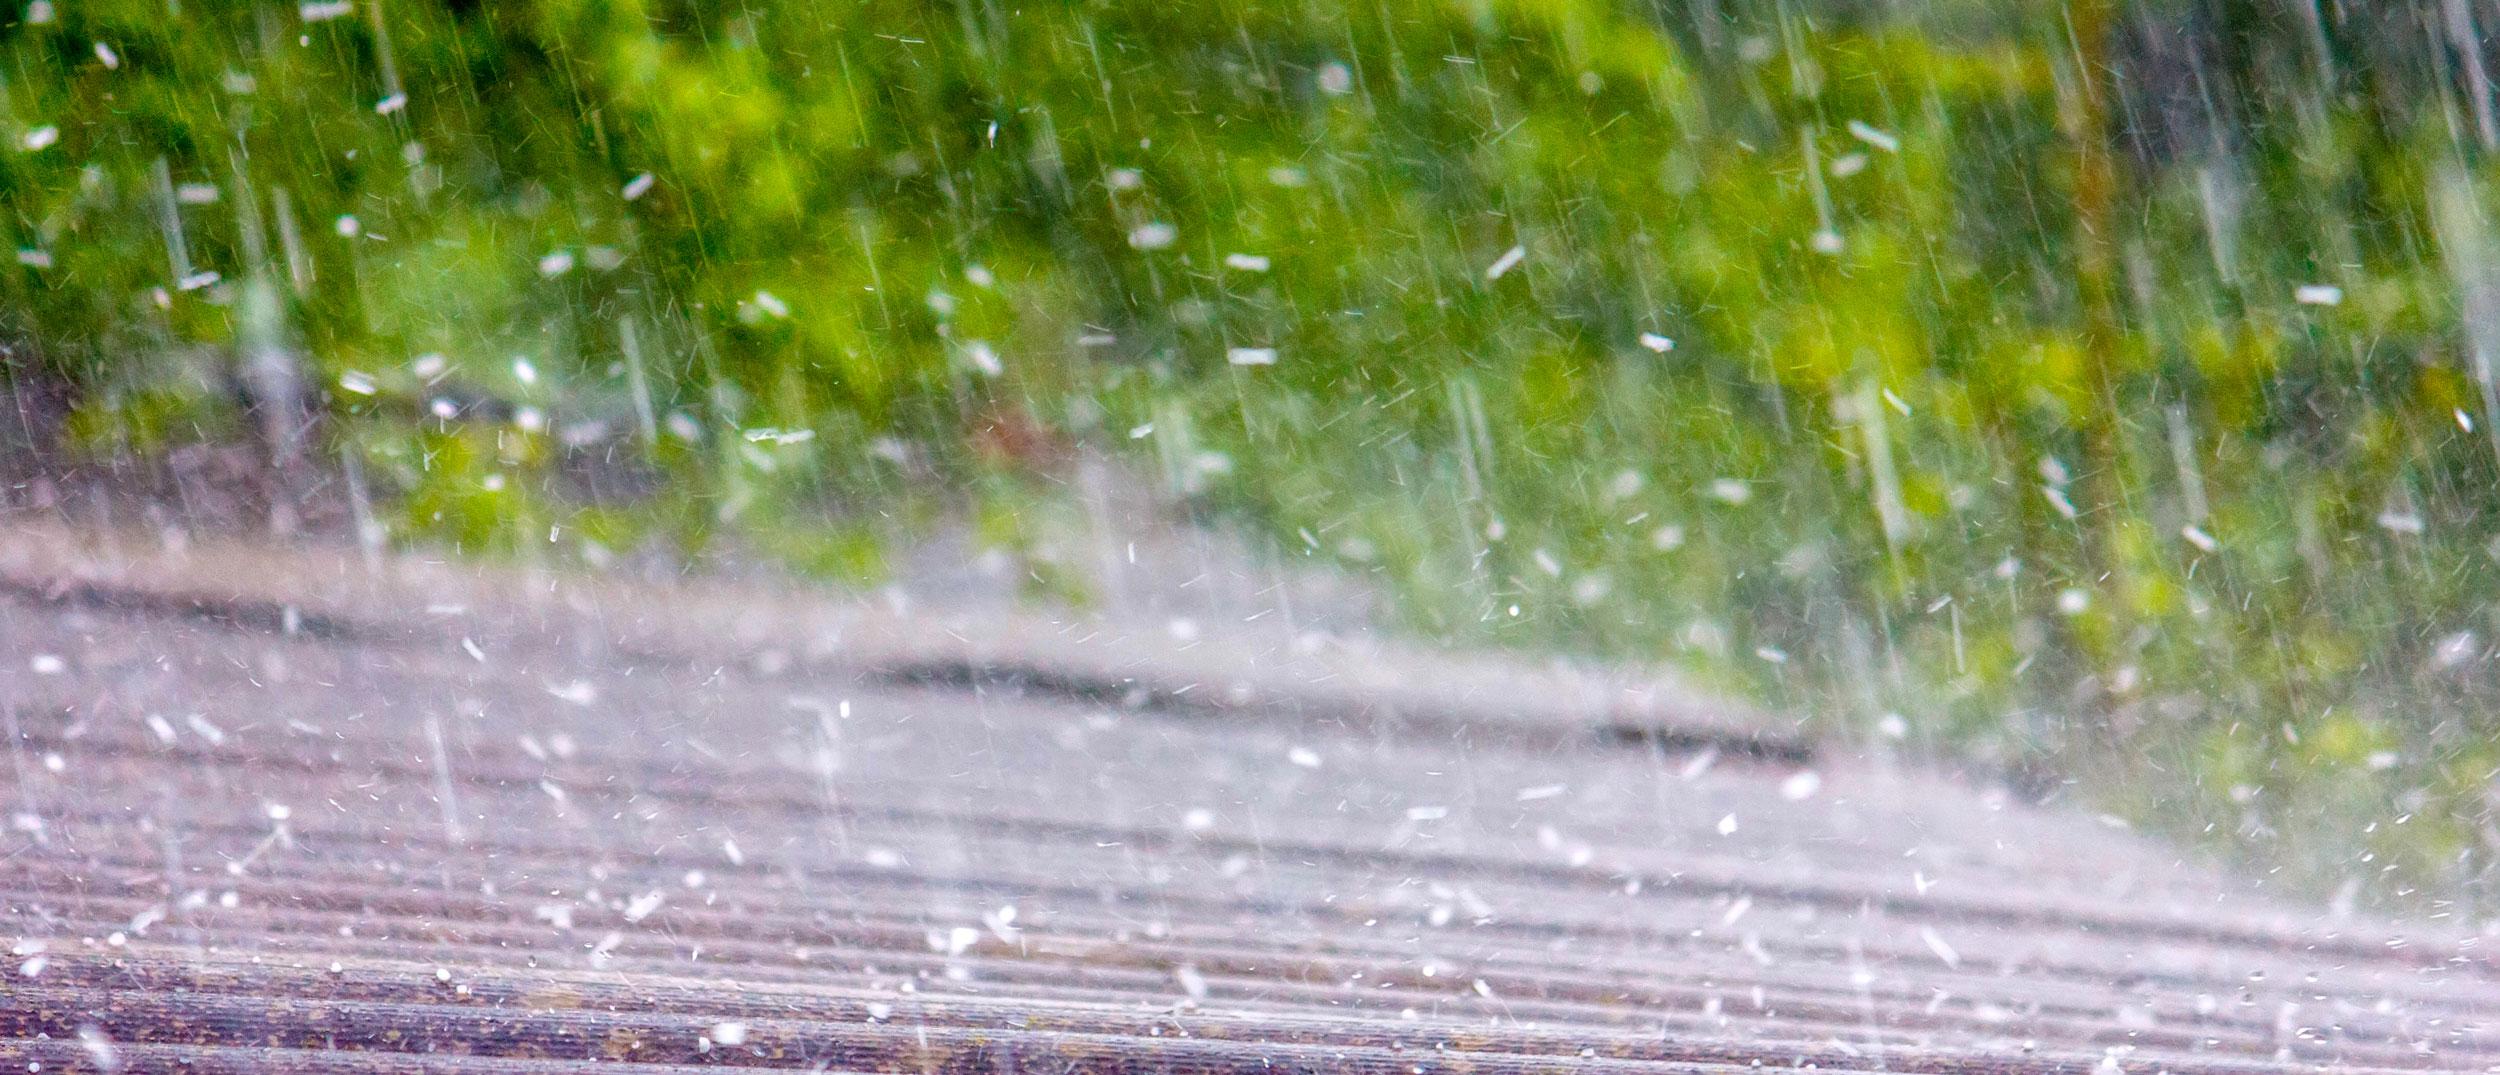 Hail hitting a roof in San Antonio hail storm